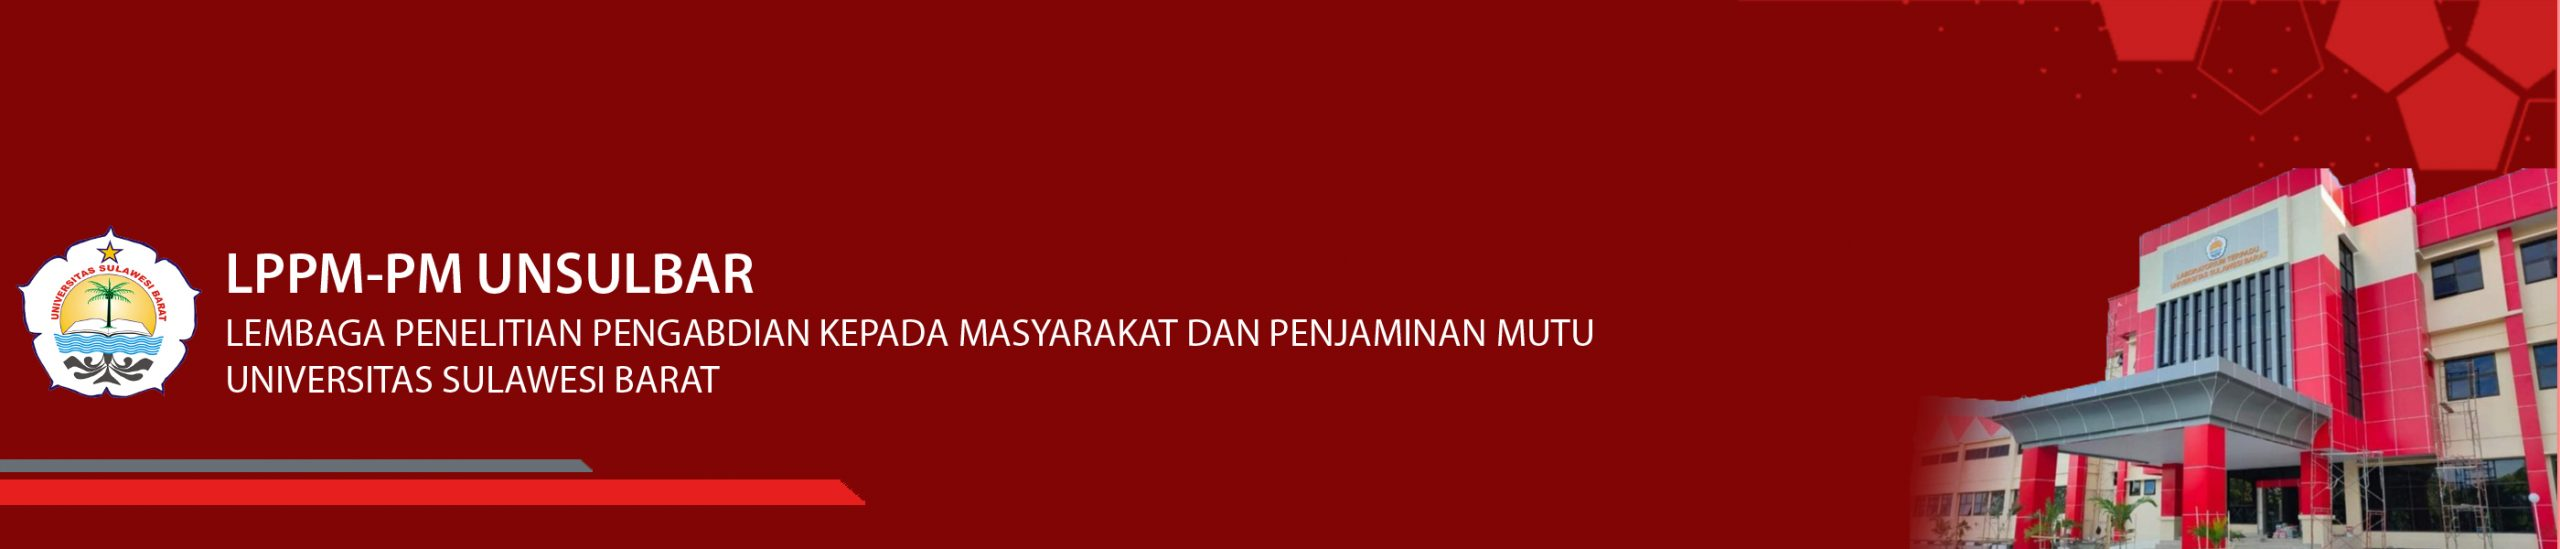 LPPM-PM UNSULBAR